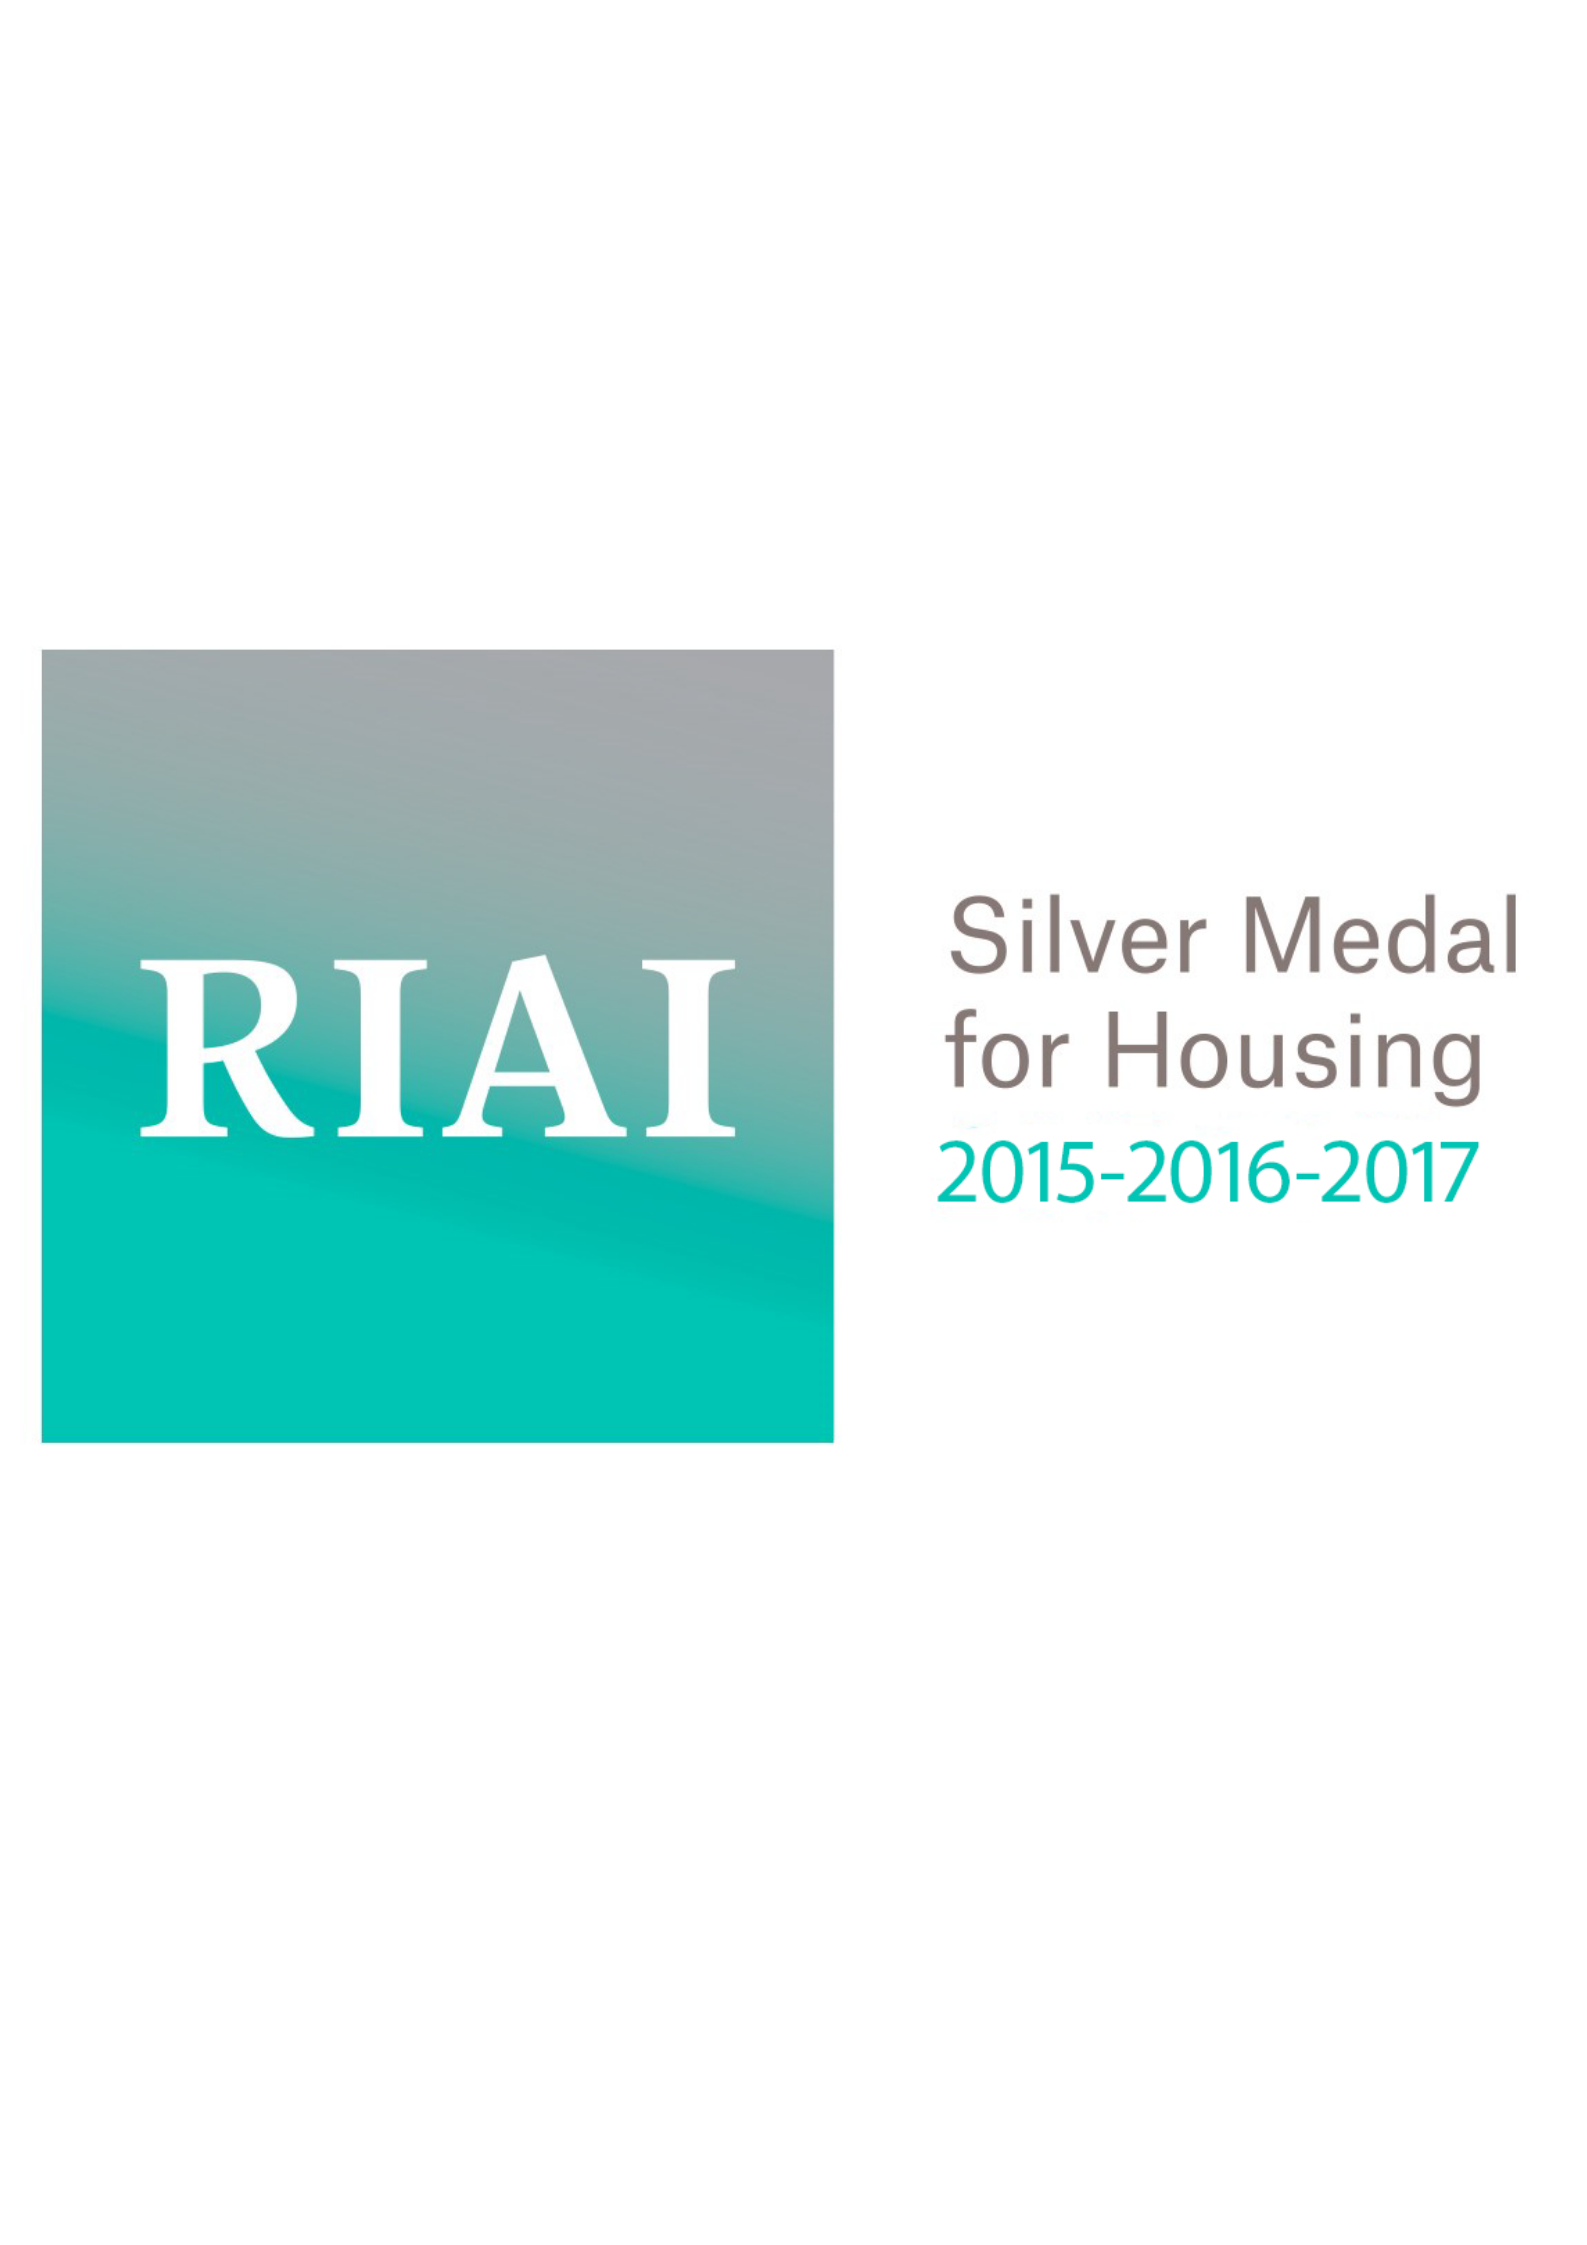 RIAI Silver Medal for Housing